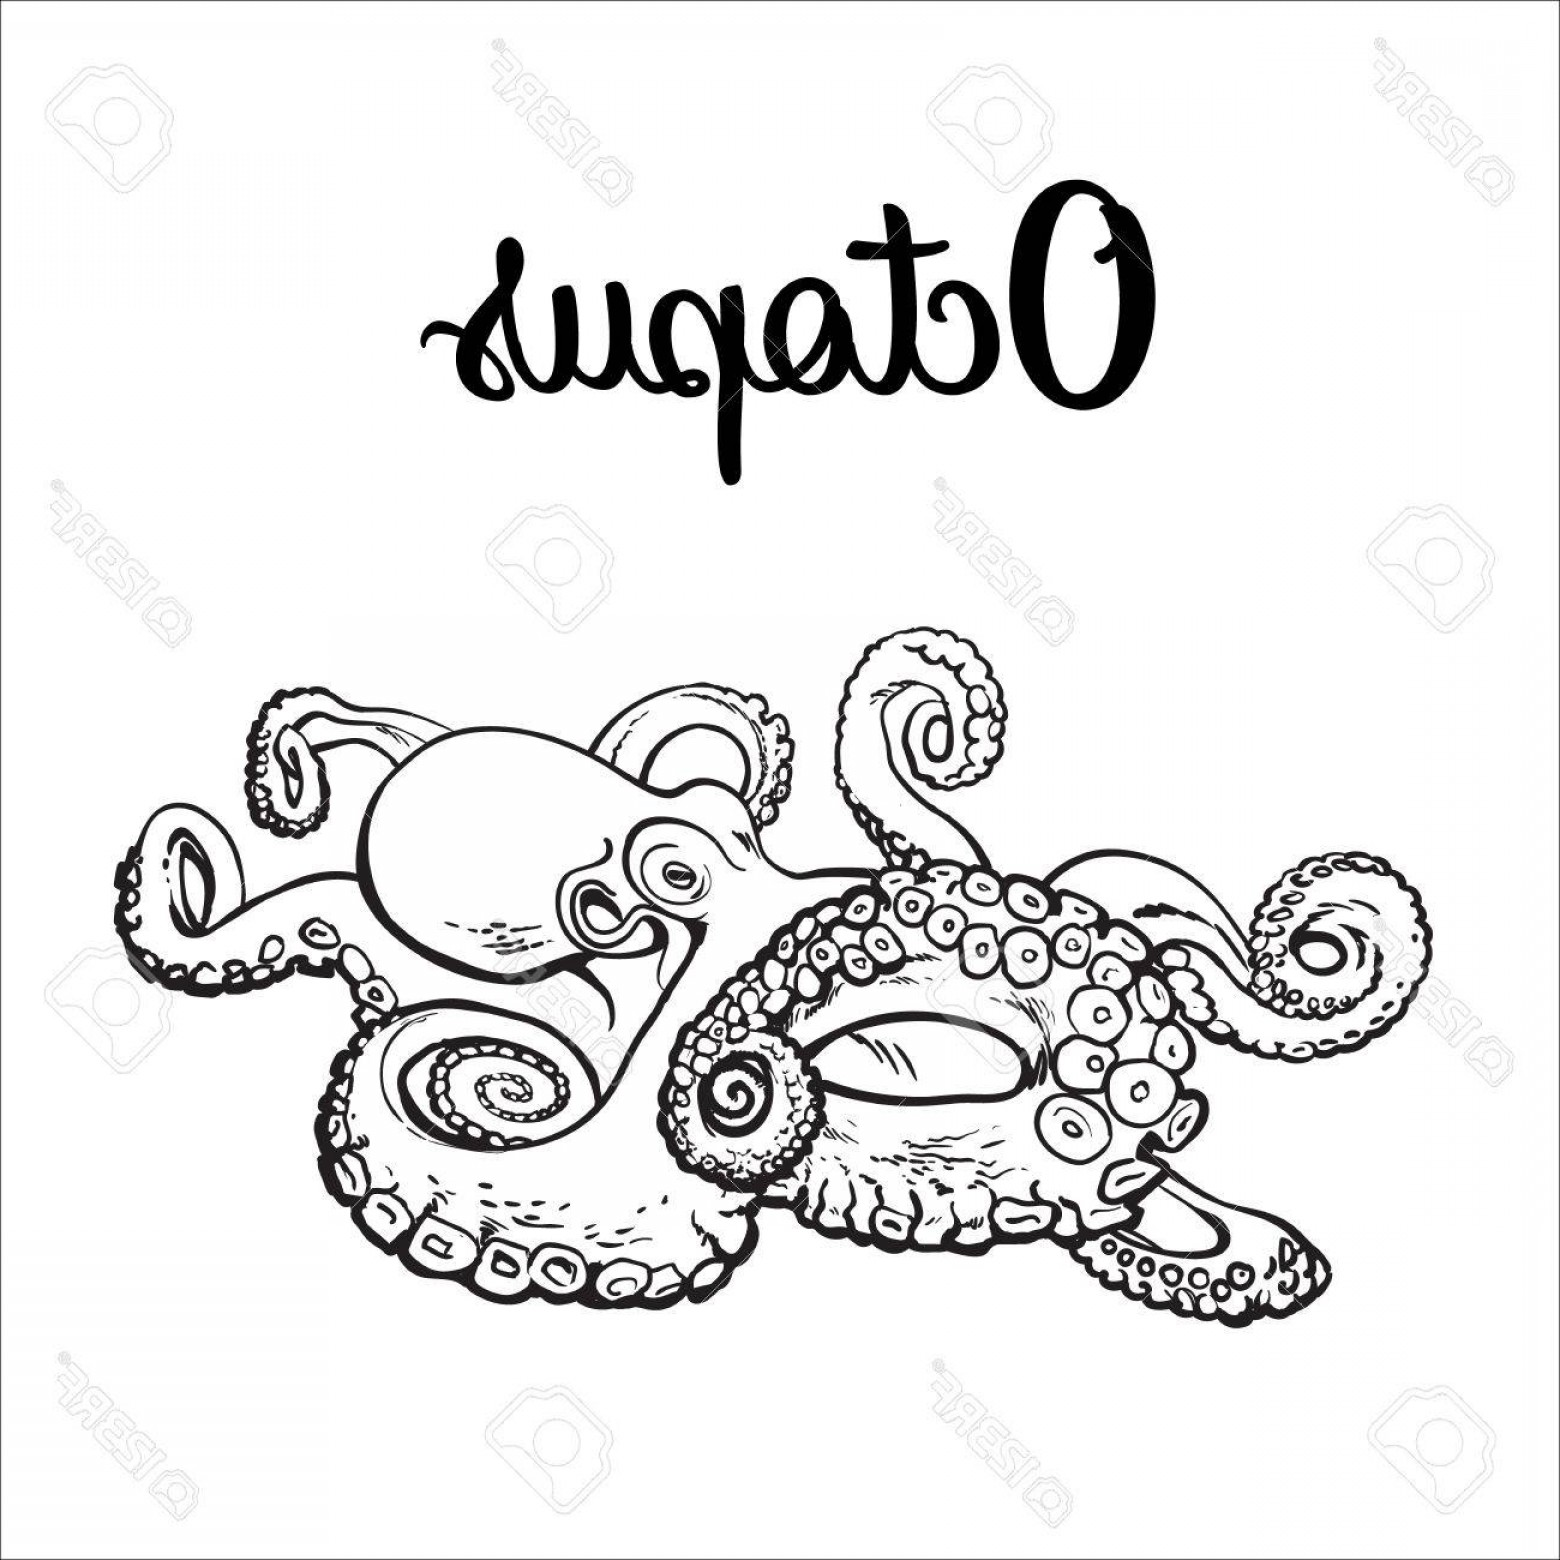 1560x1560 Photostock Vector Live Octopus Sketch Style Vector Illustration